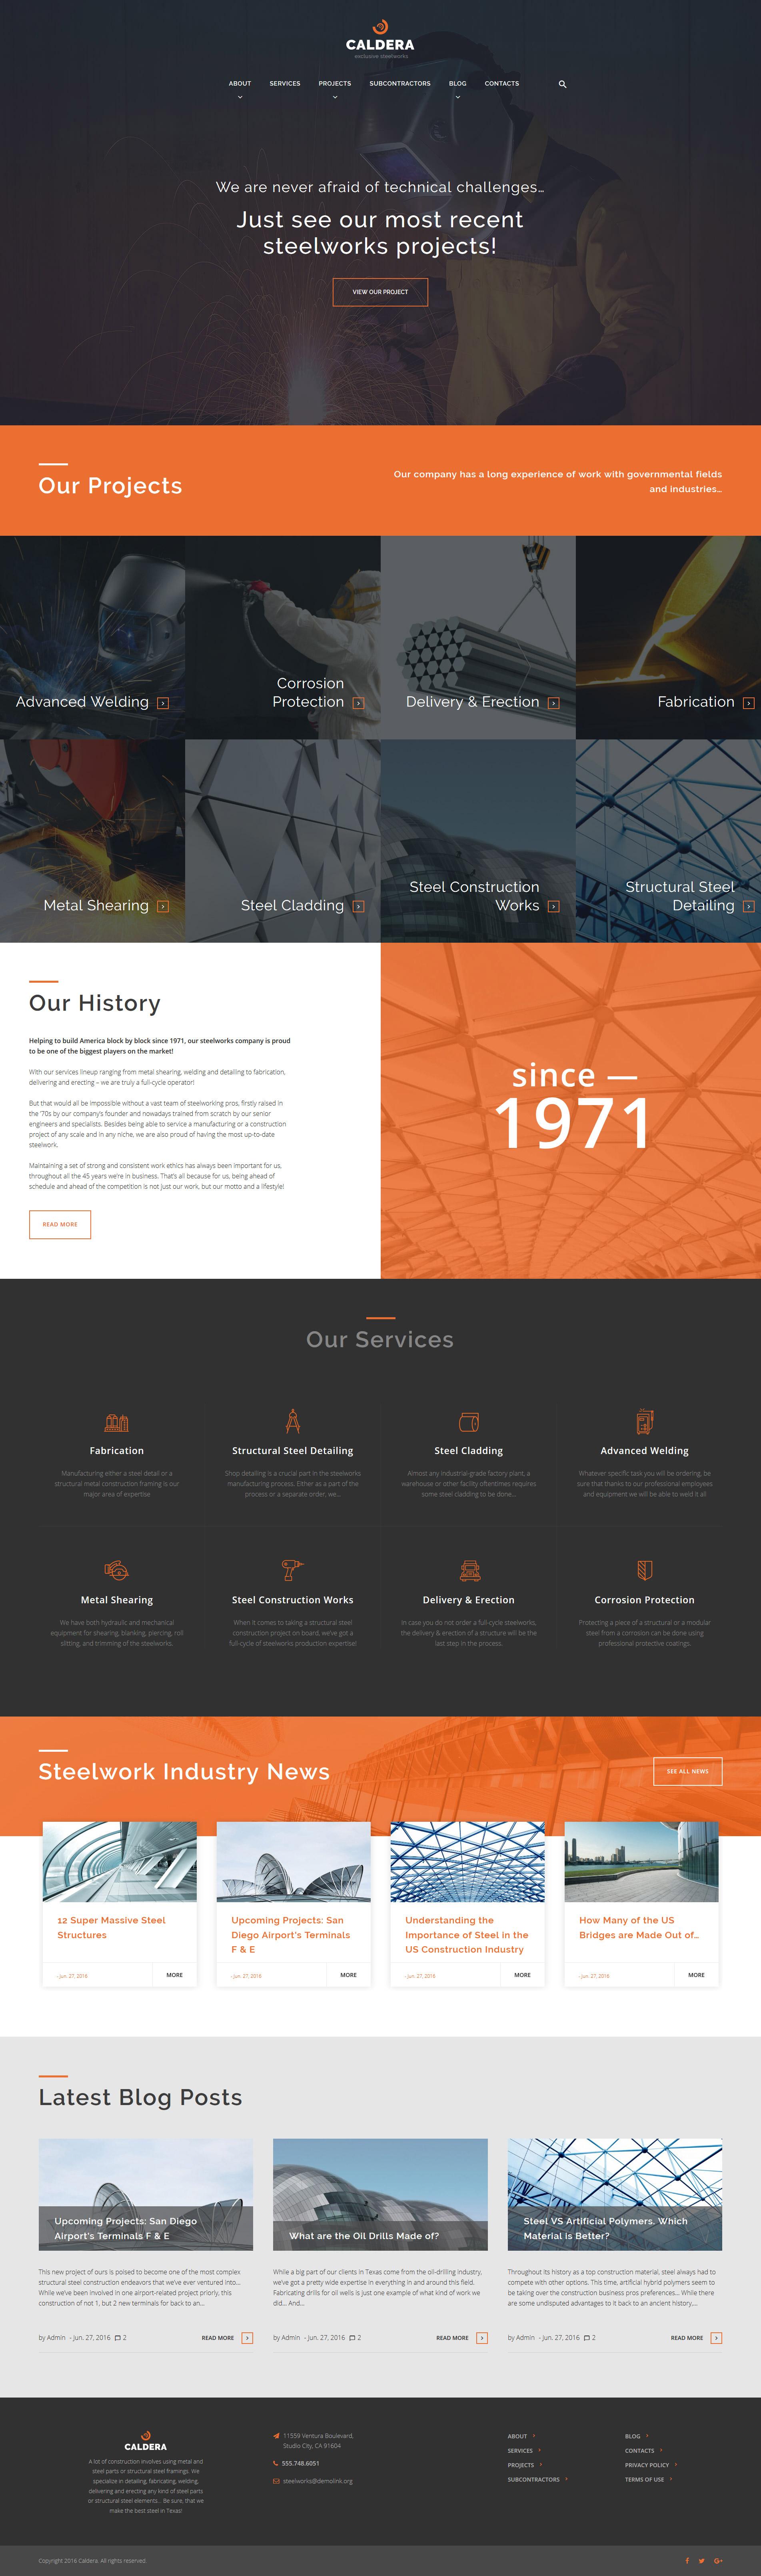 """Caldera - Steelworks and Constructions"" thème WordPress adaptatif #59027"